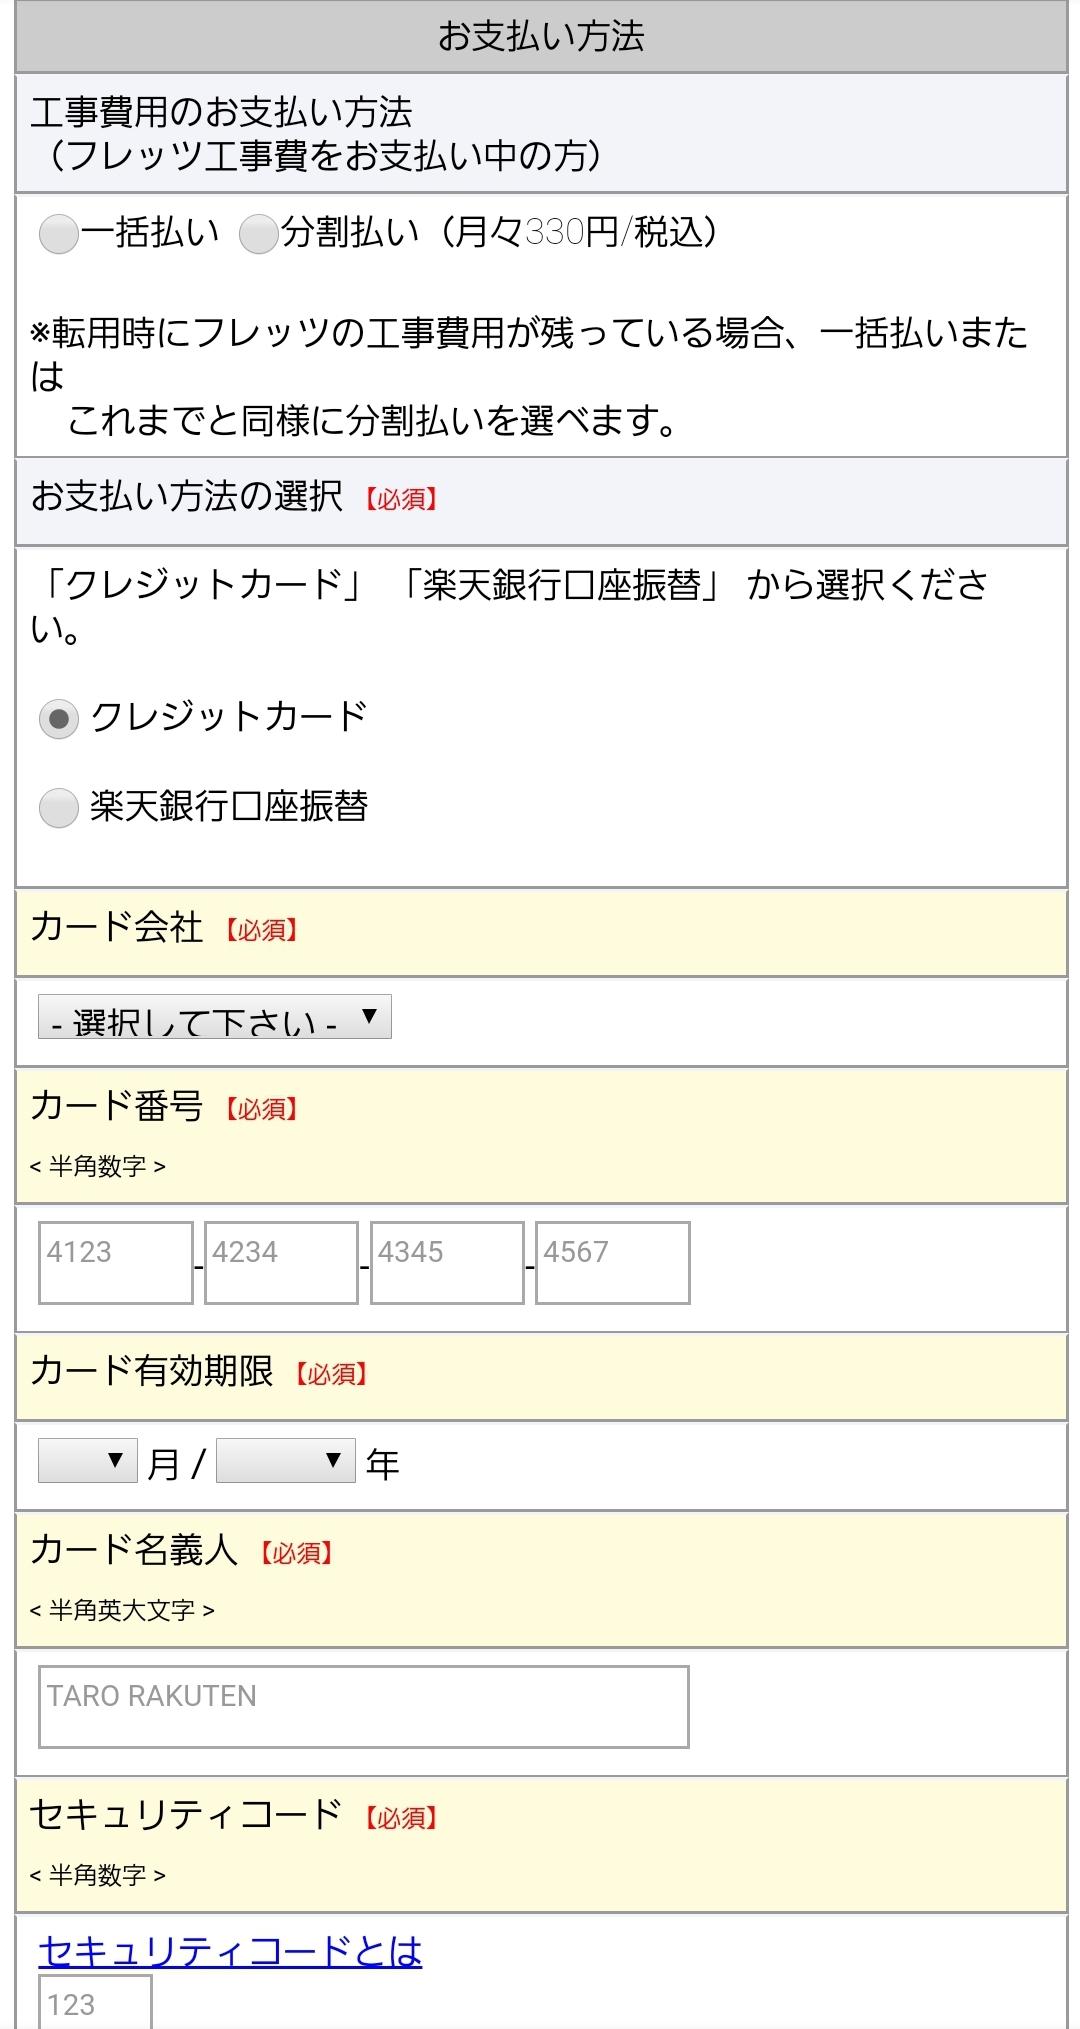 支払い方法登録